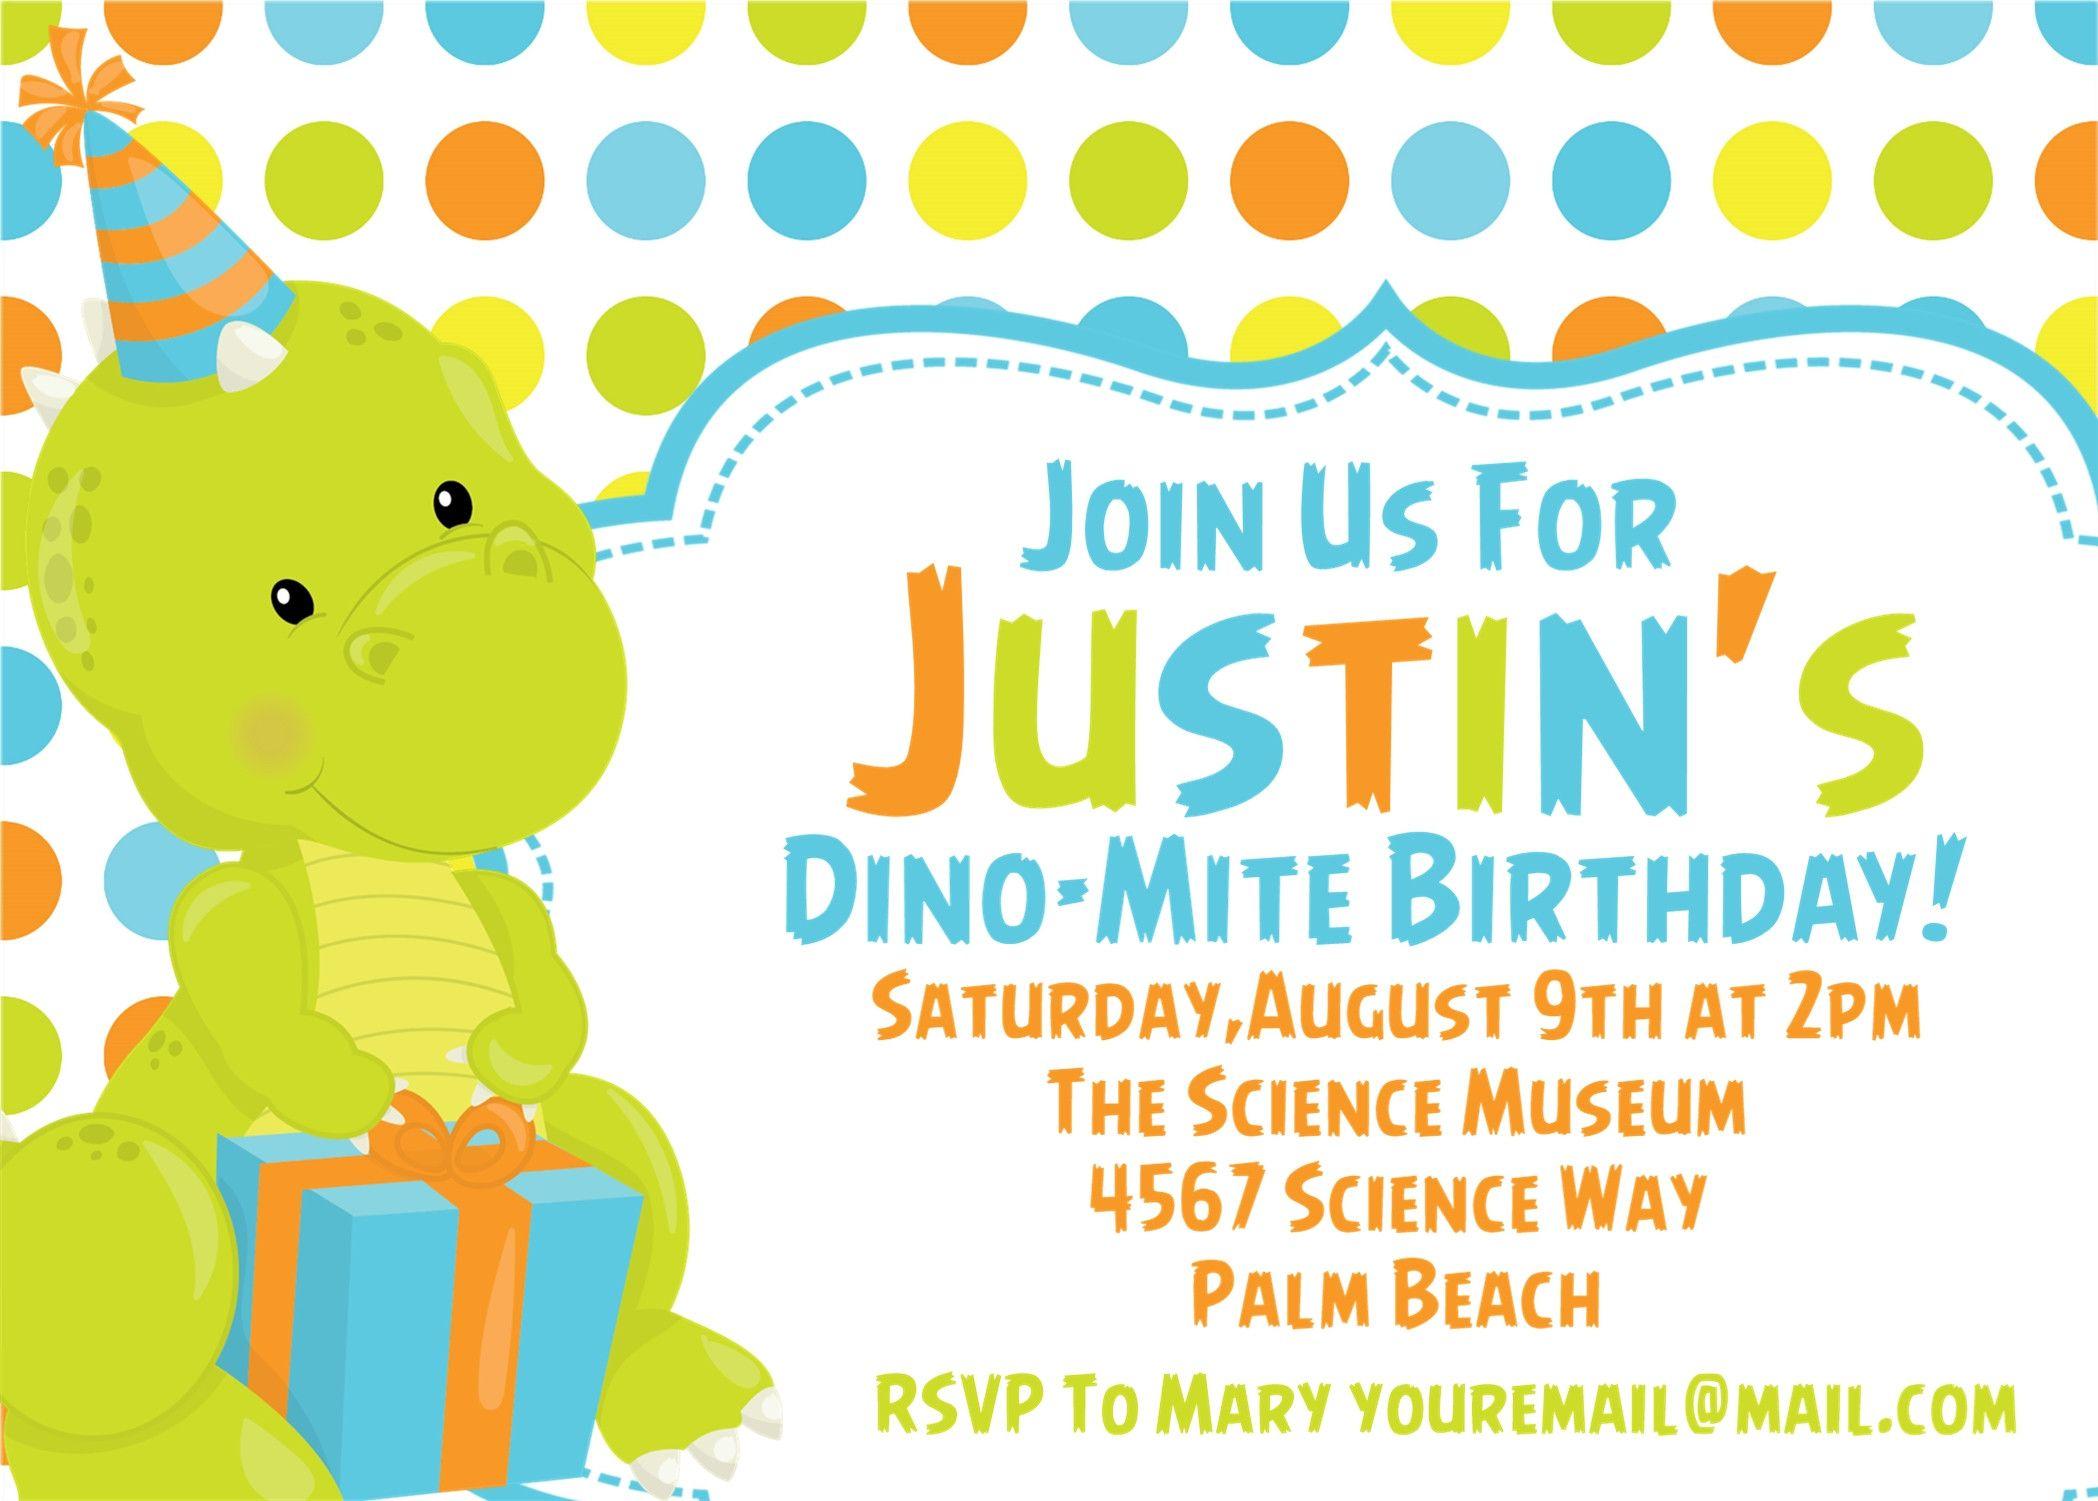 Baby Dinosaur Birthday Party Invitations